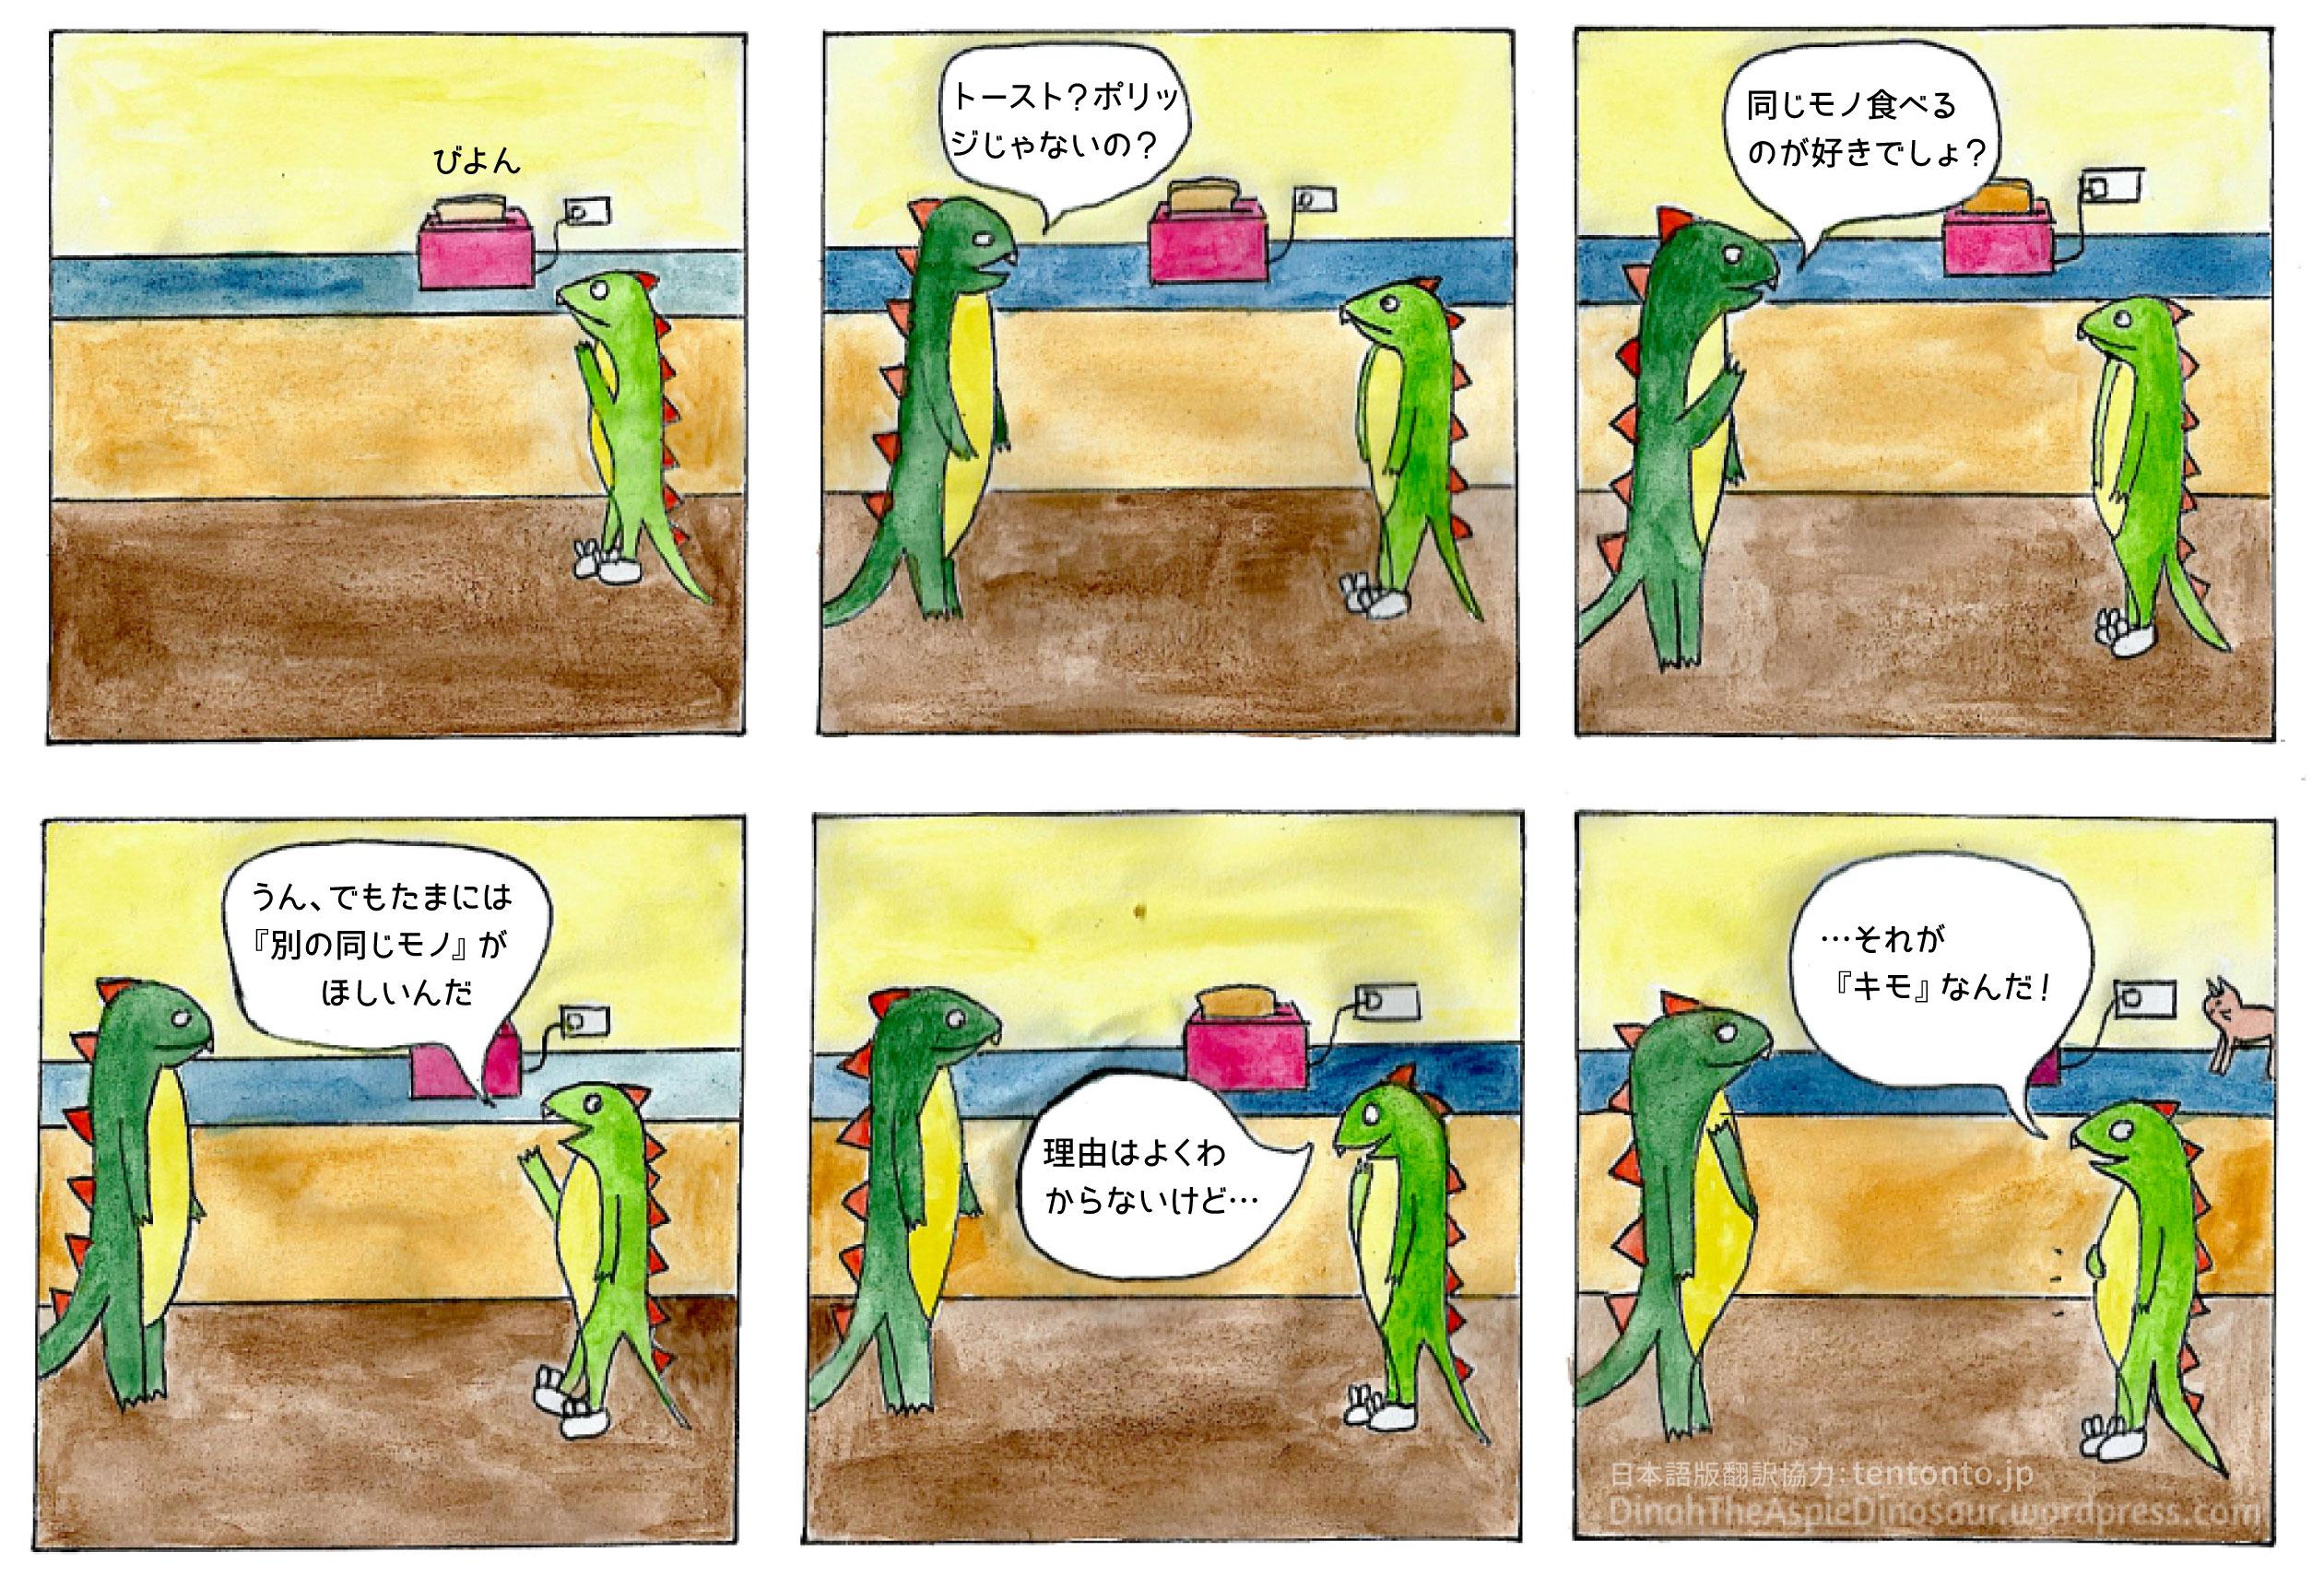 toast-2_dinah_tentonto_comic